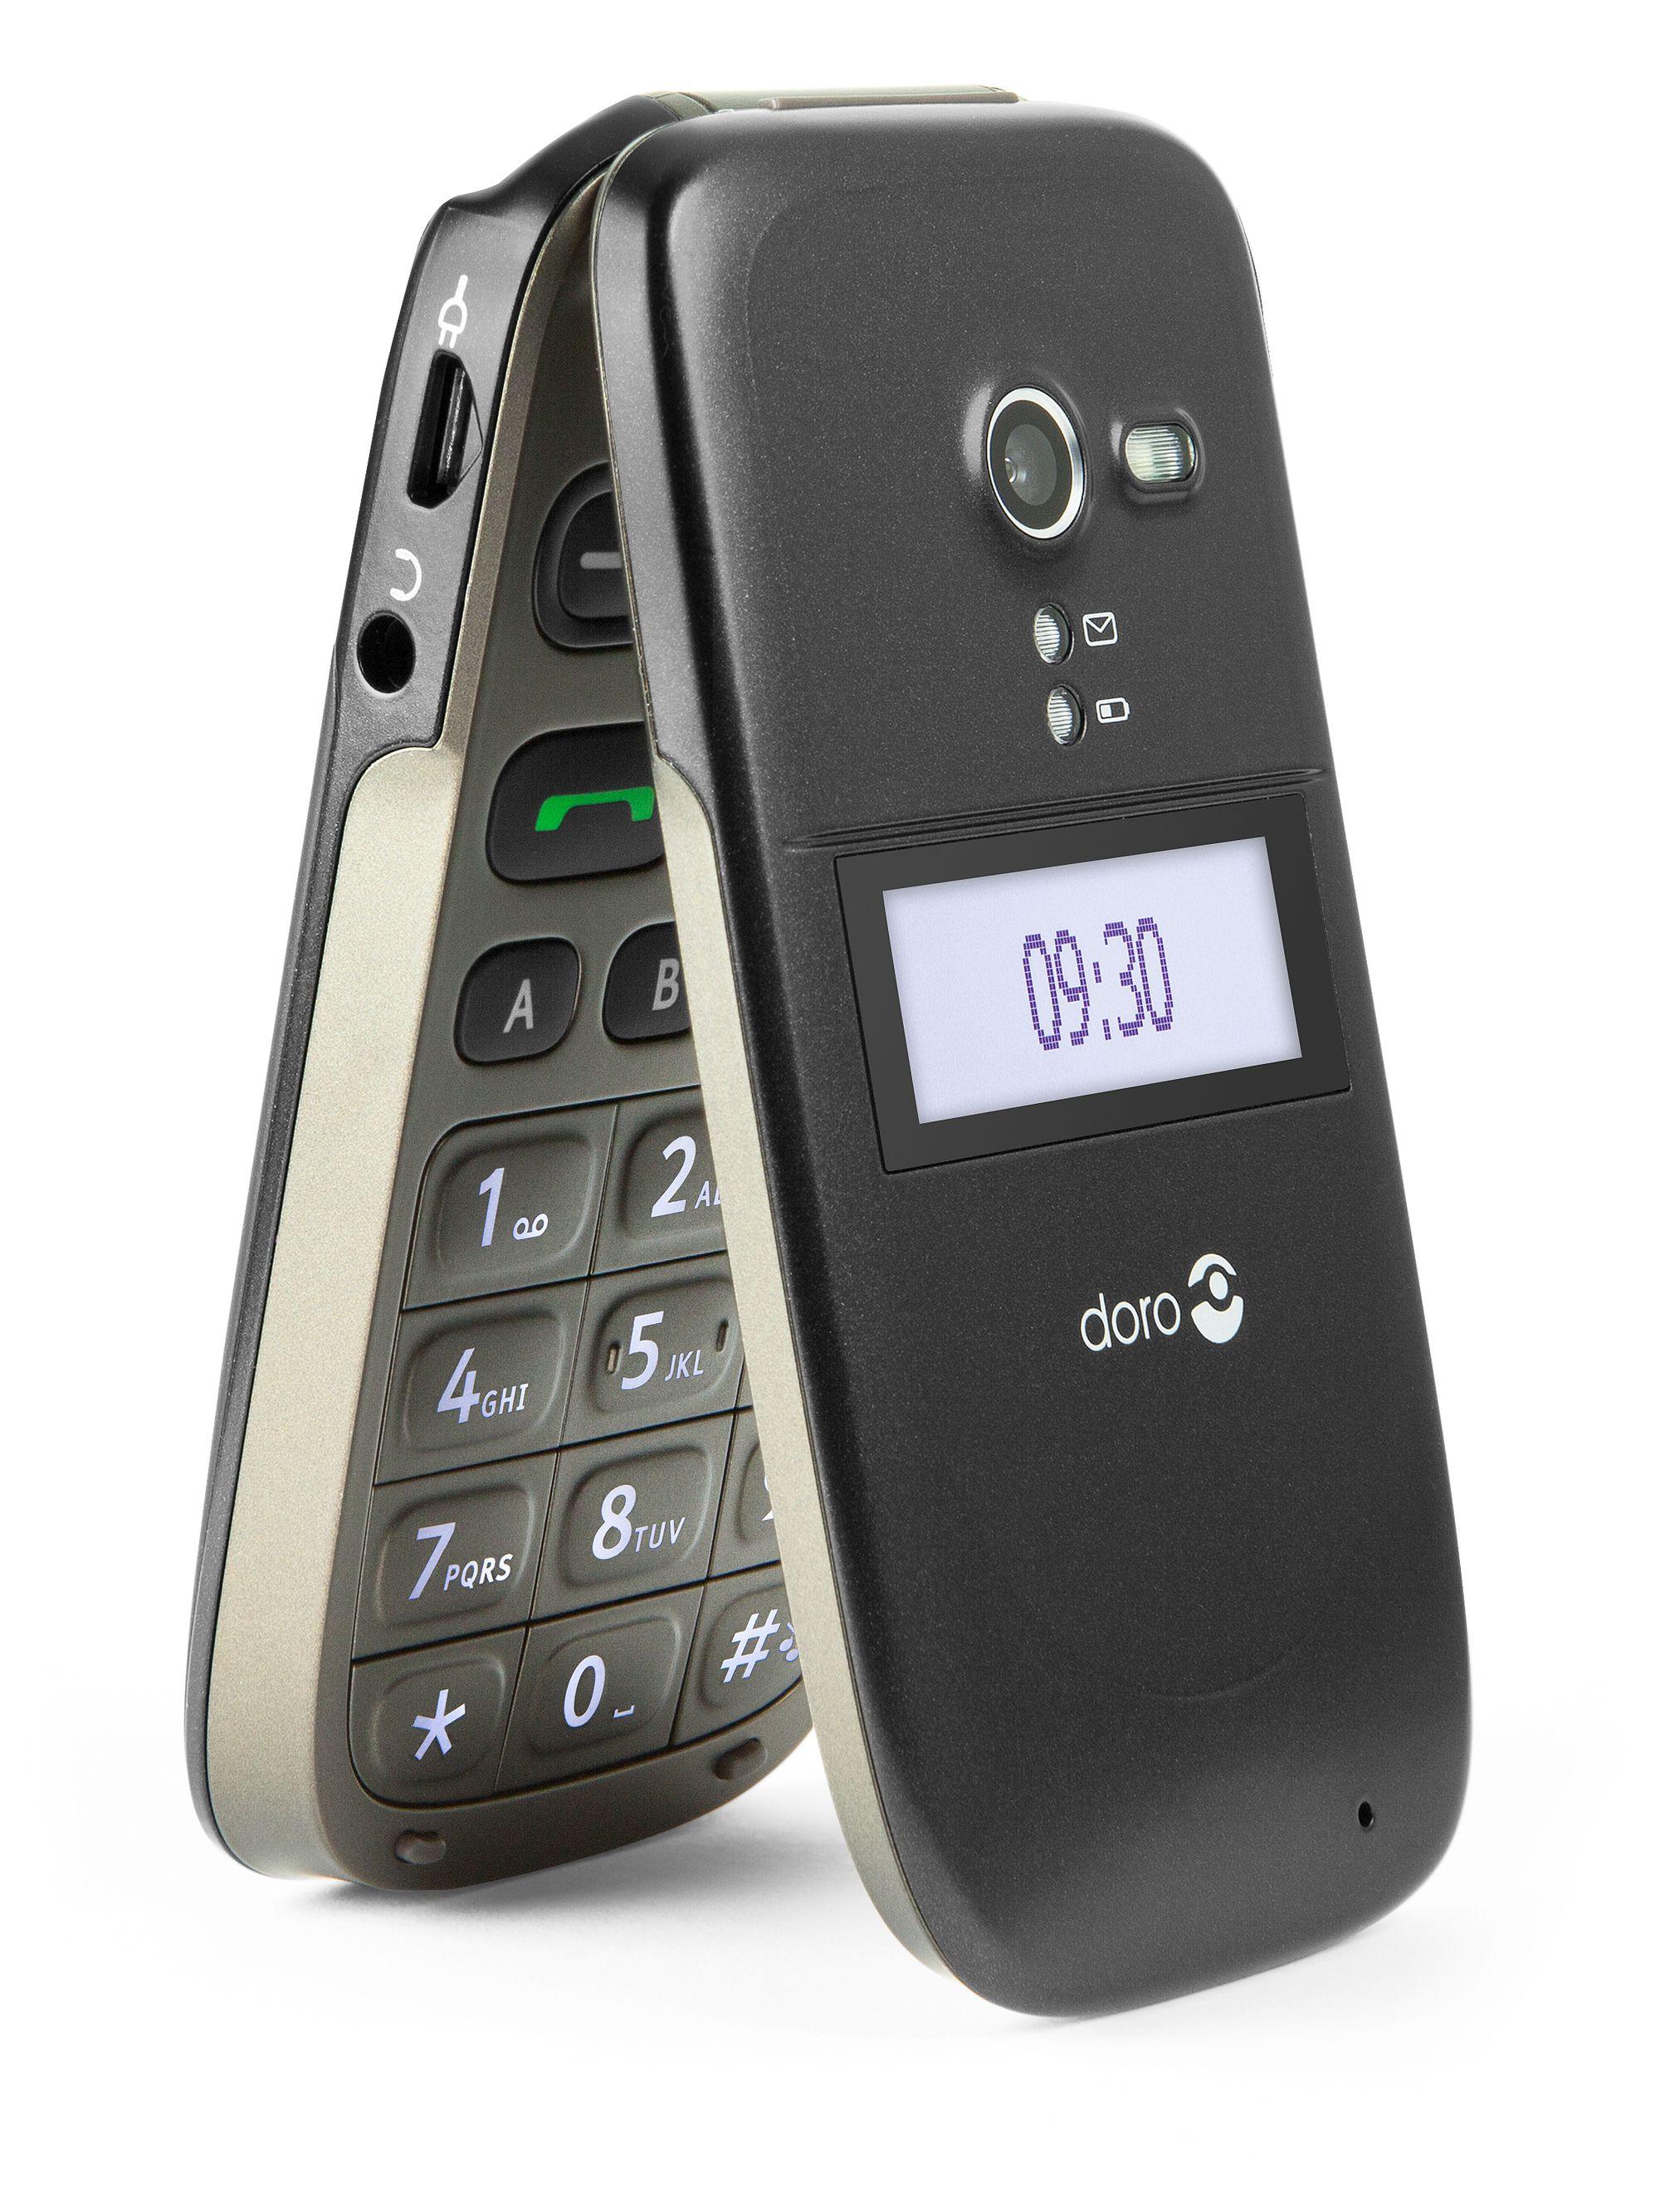 mobiltelefon priser abonnement